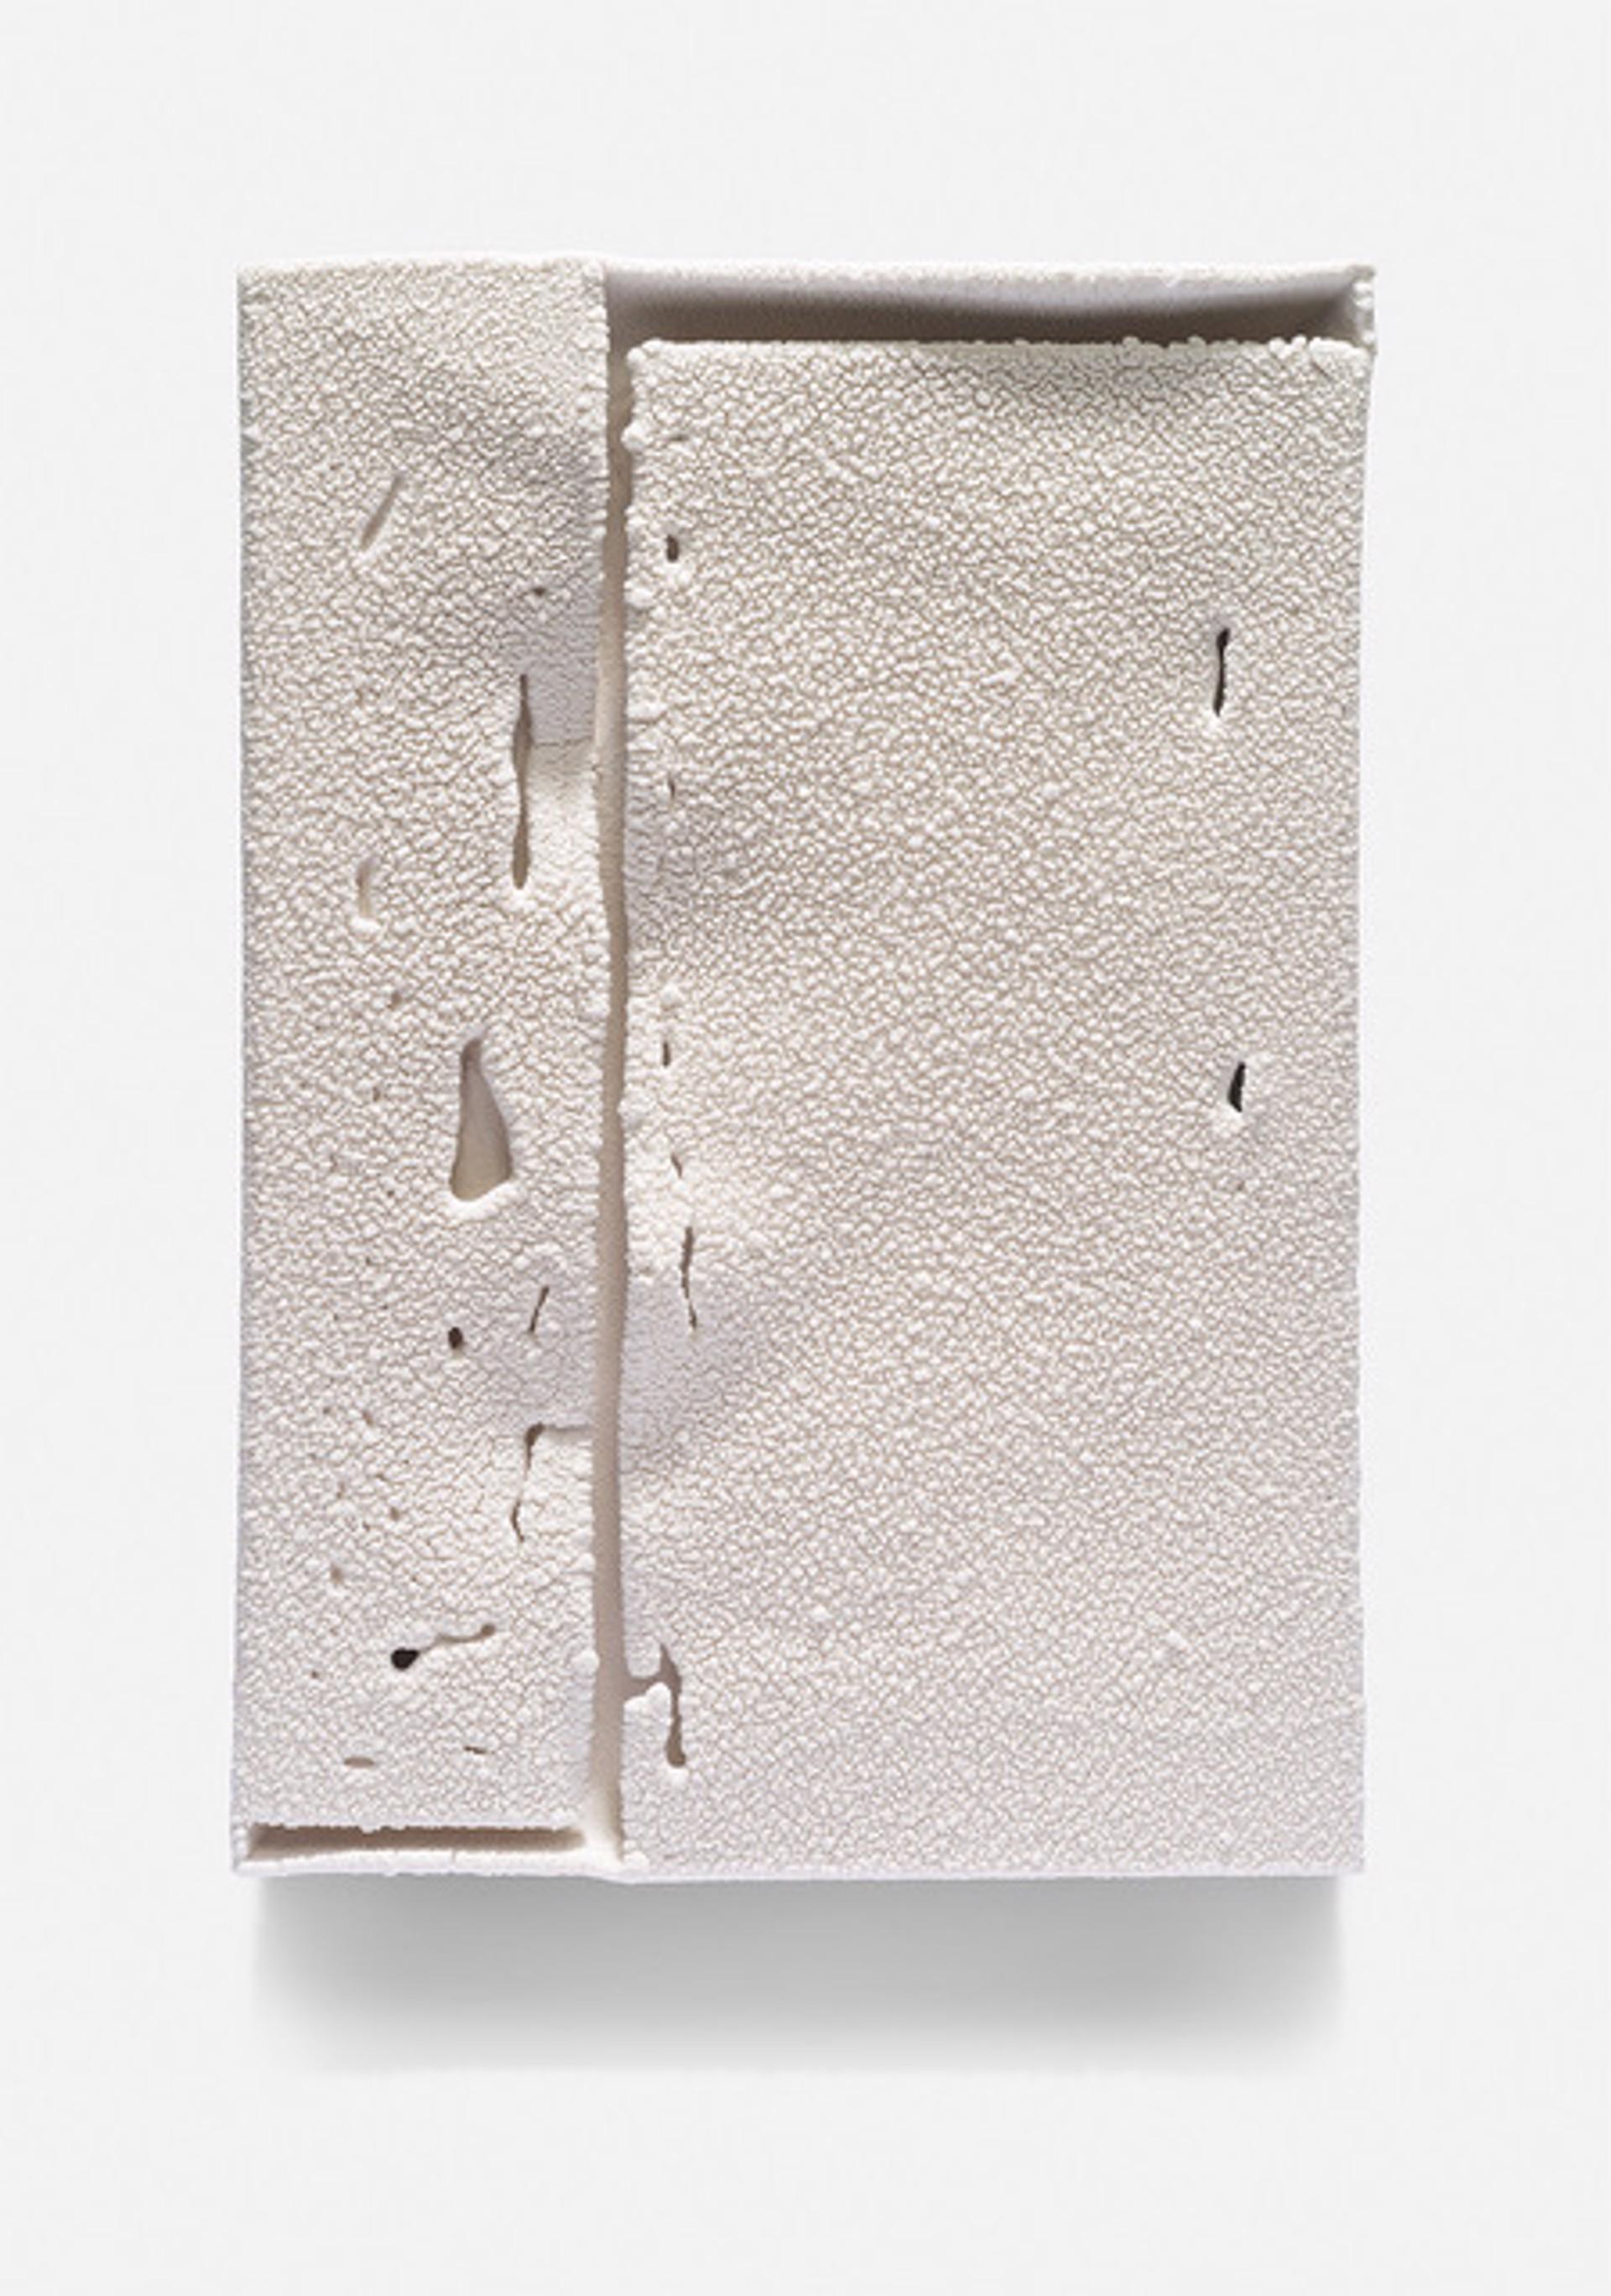 Parfleche (w13) by Cary Esser